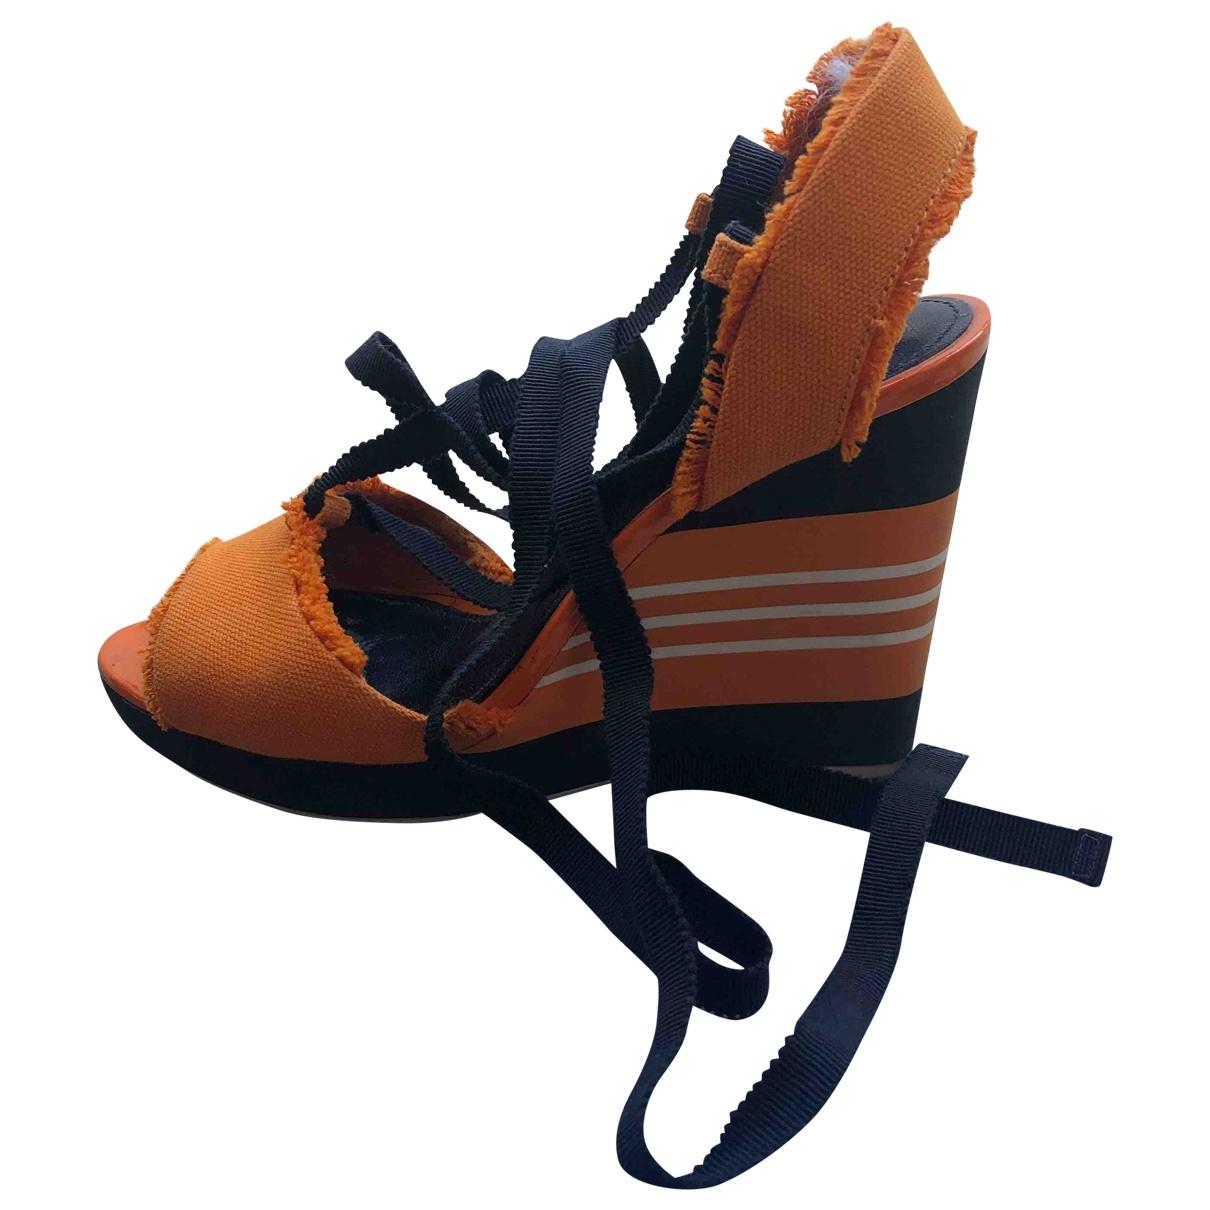 Prada \N Orange Cloth Sandals for Women 35.5 EU